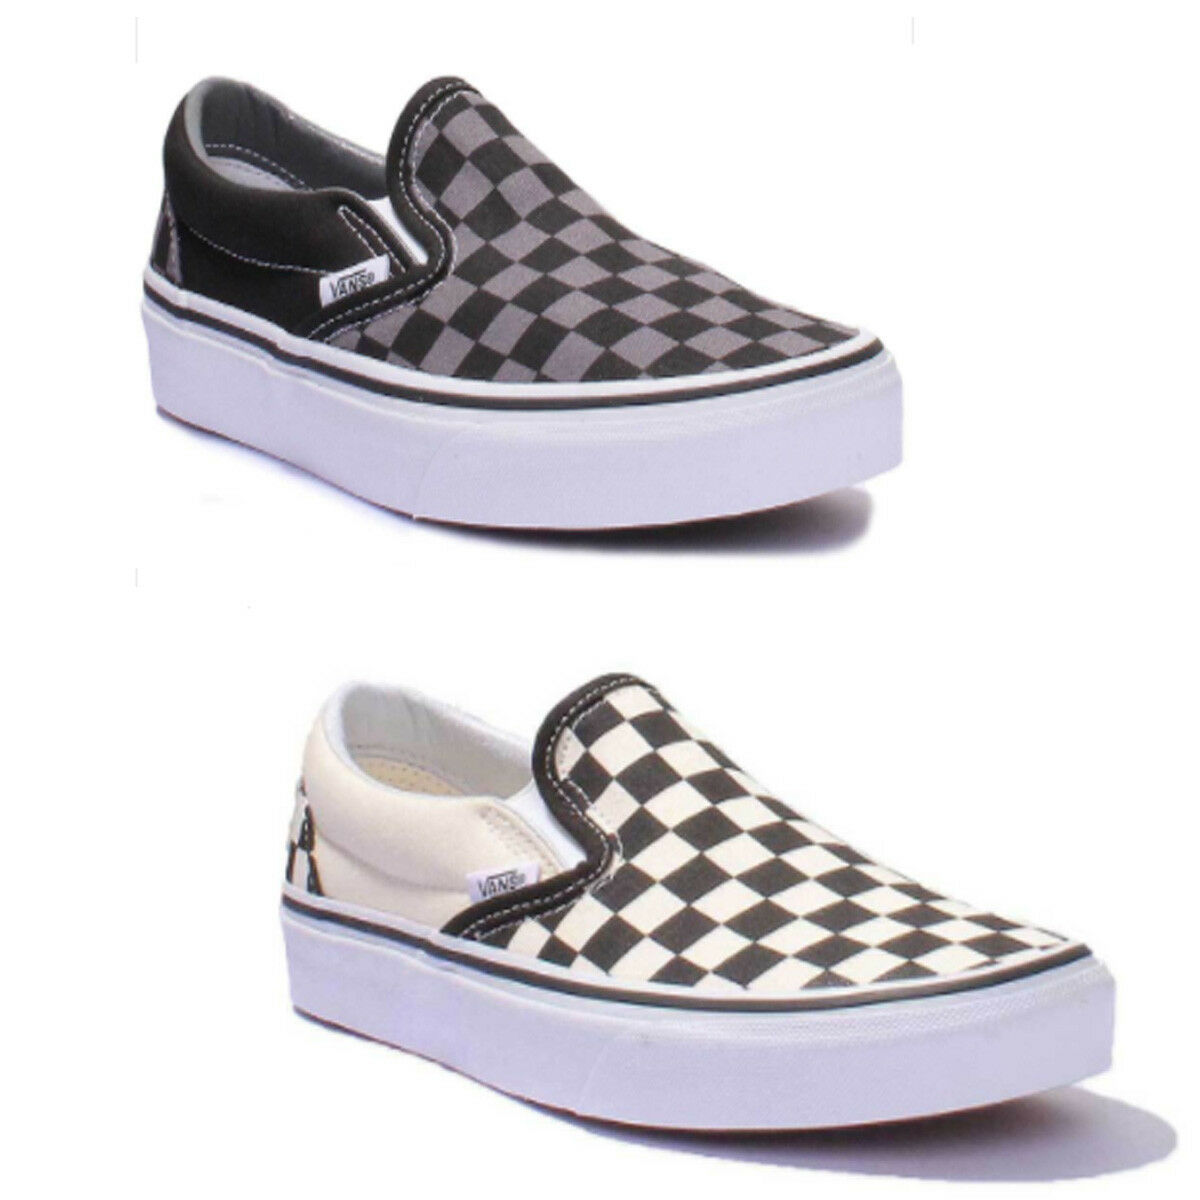 Vans Checkerboard Slip On femmes Canvas Trainers 3 - 6.5